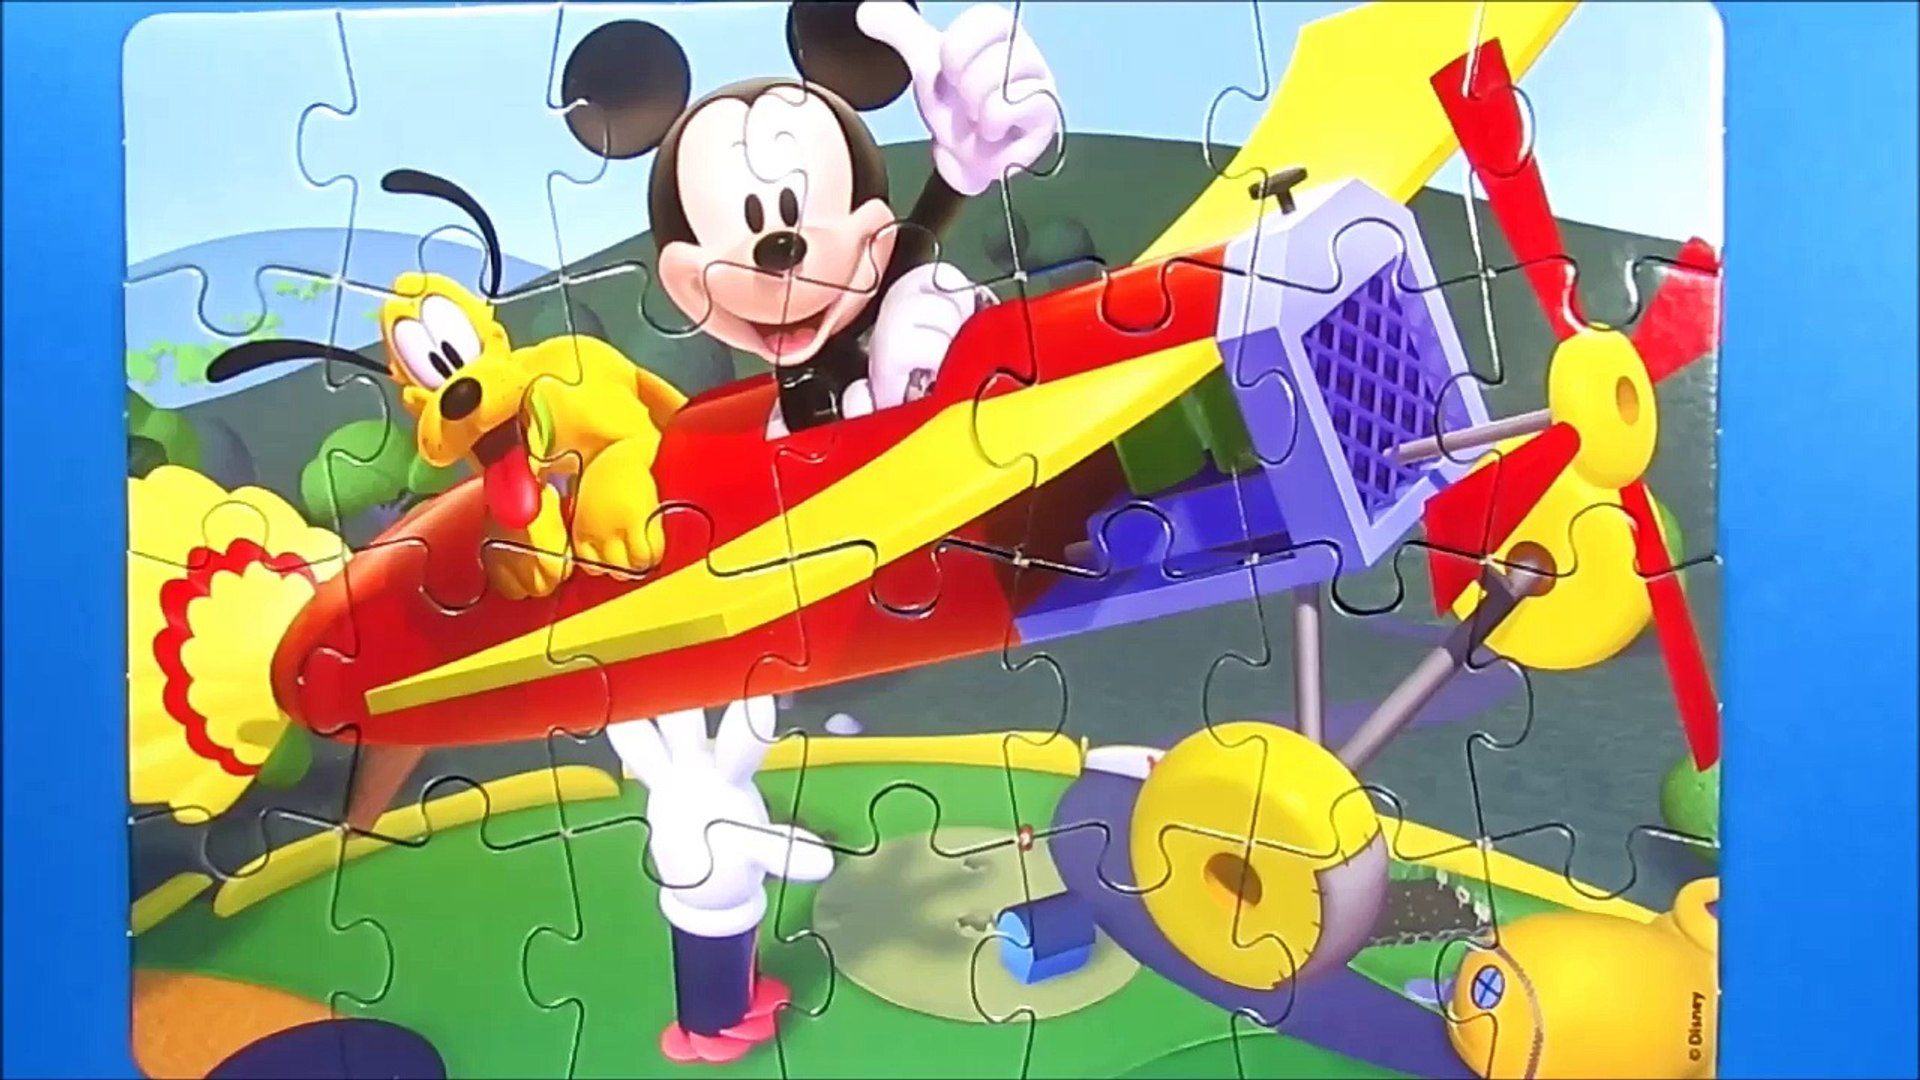 Disney Puzzle Games for kids rompecabezas learning activities quebra cabeça play kids clementoni